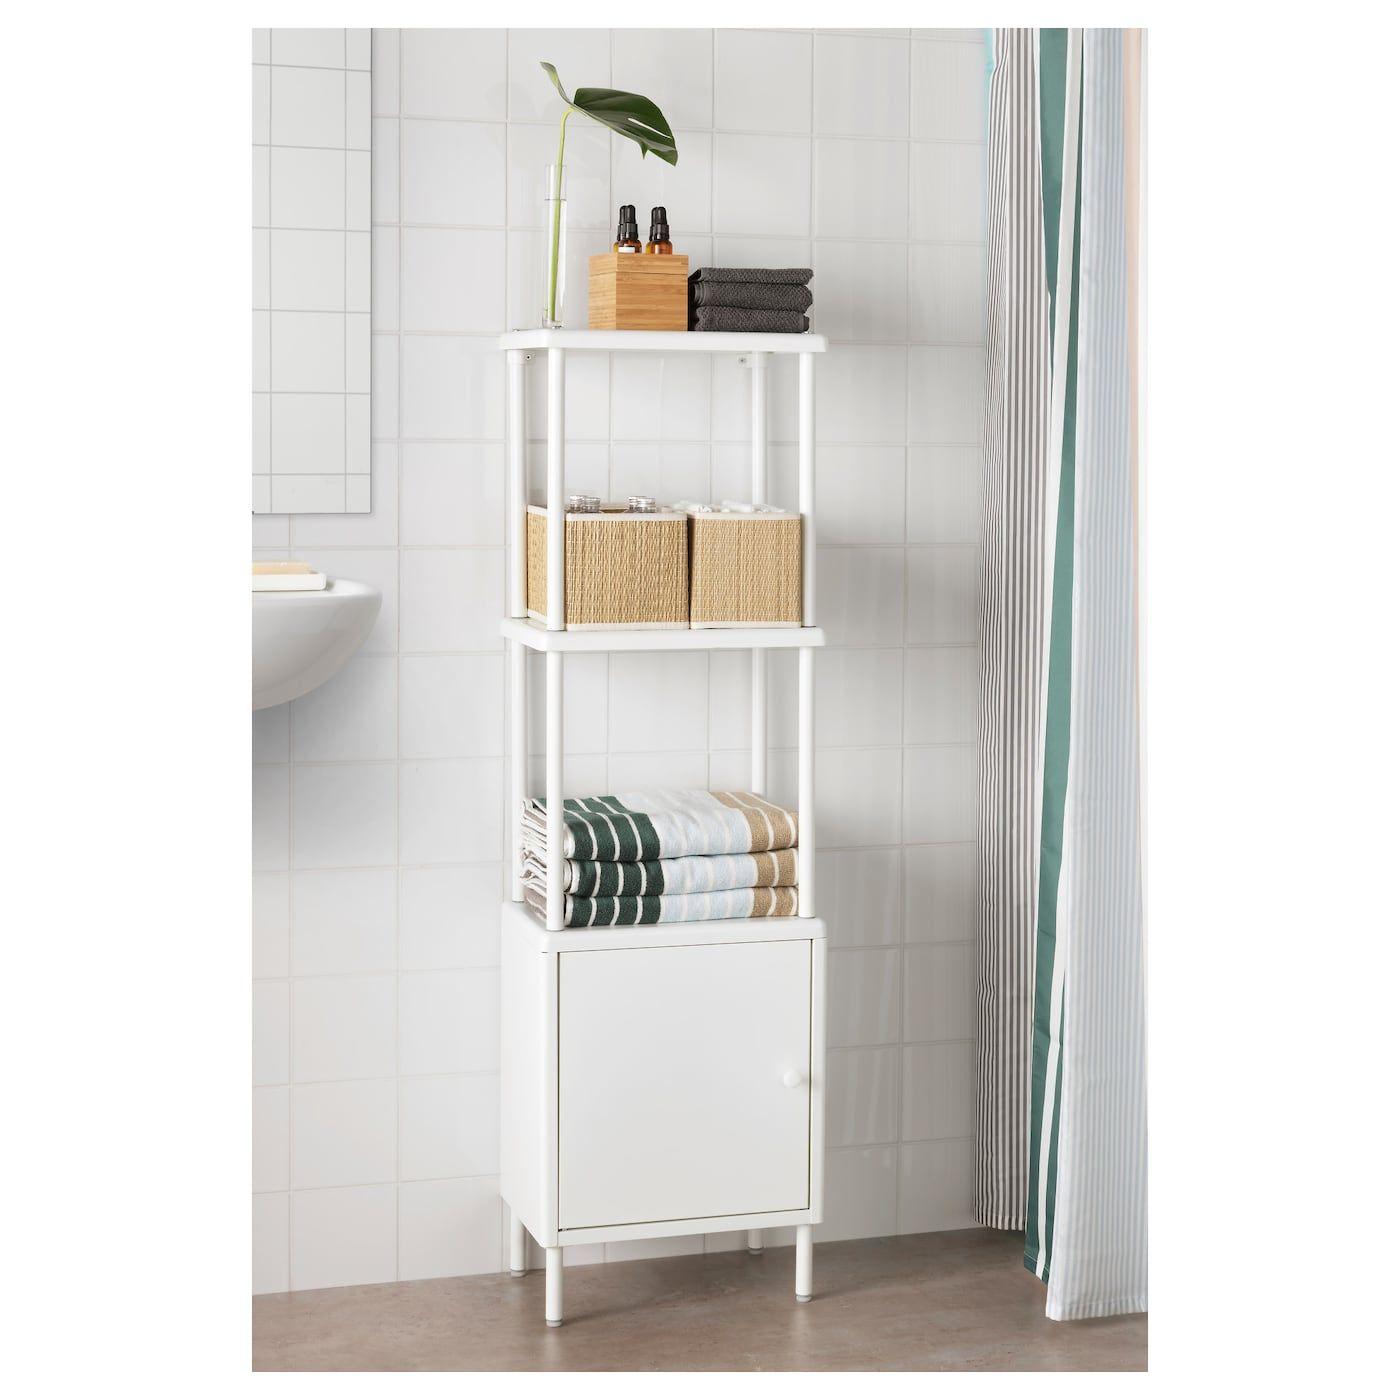 Dynan Shelving Unit With Cabinet White 40x27x134 Cm Ikea Skapdorrar Litet Badrum Ikea